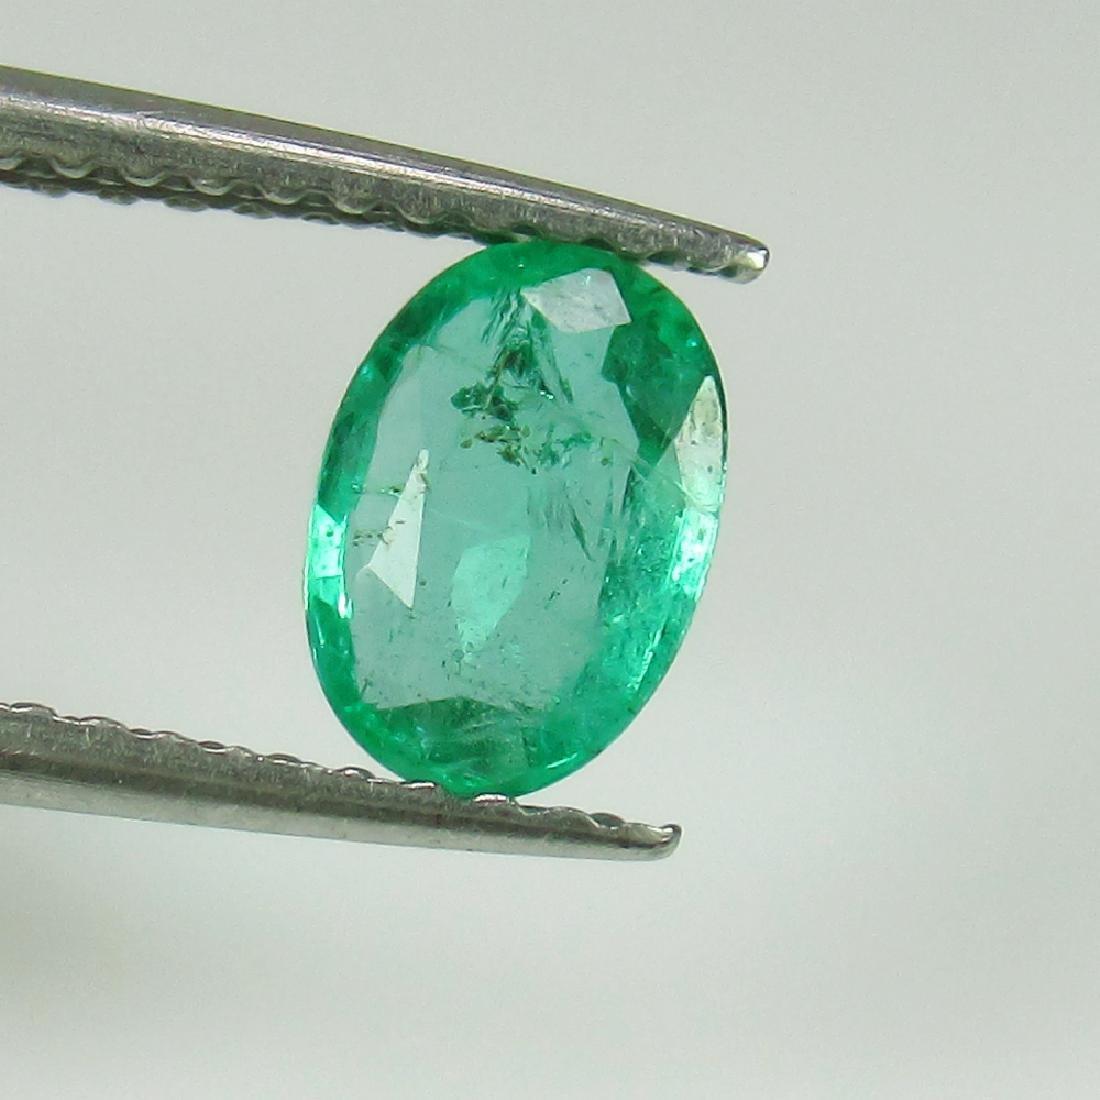 0.62 Ctw Natural Zambian Emerald Nice Oval Cut